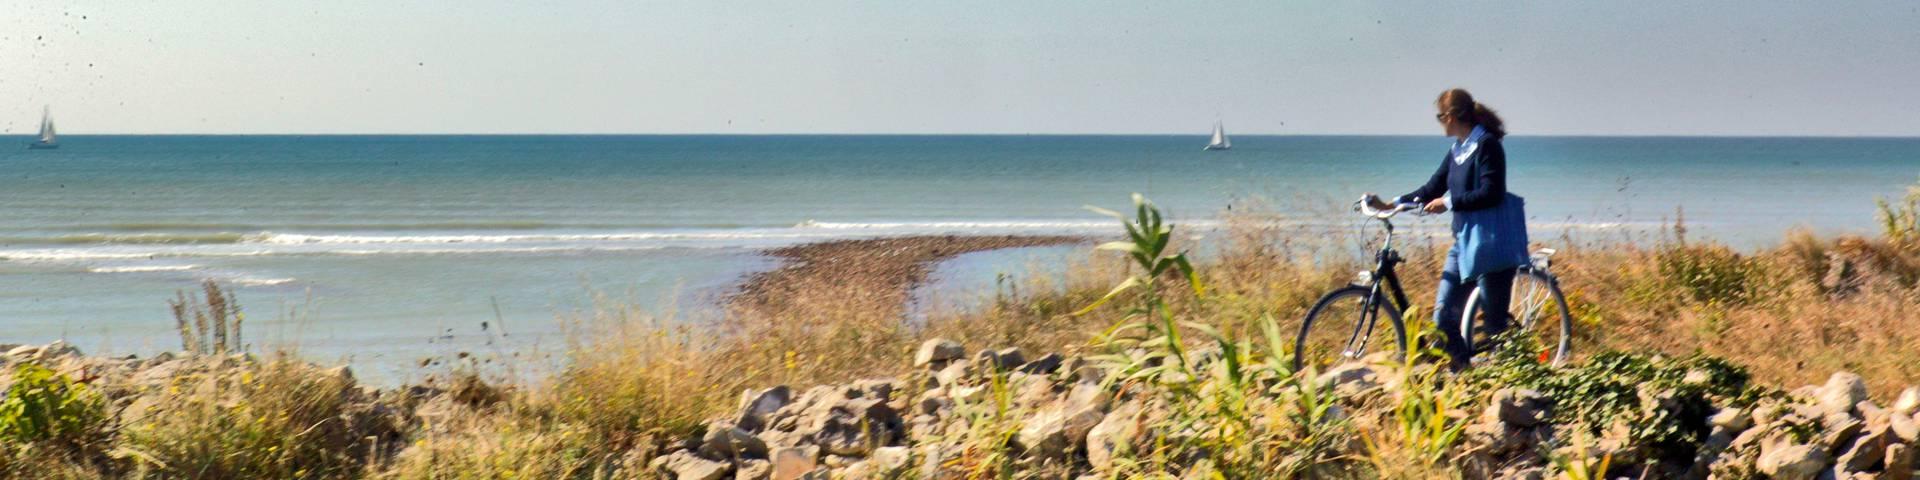 Balade au bord de mer ©Jac'phot